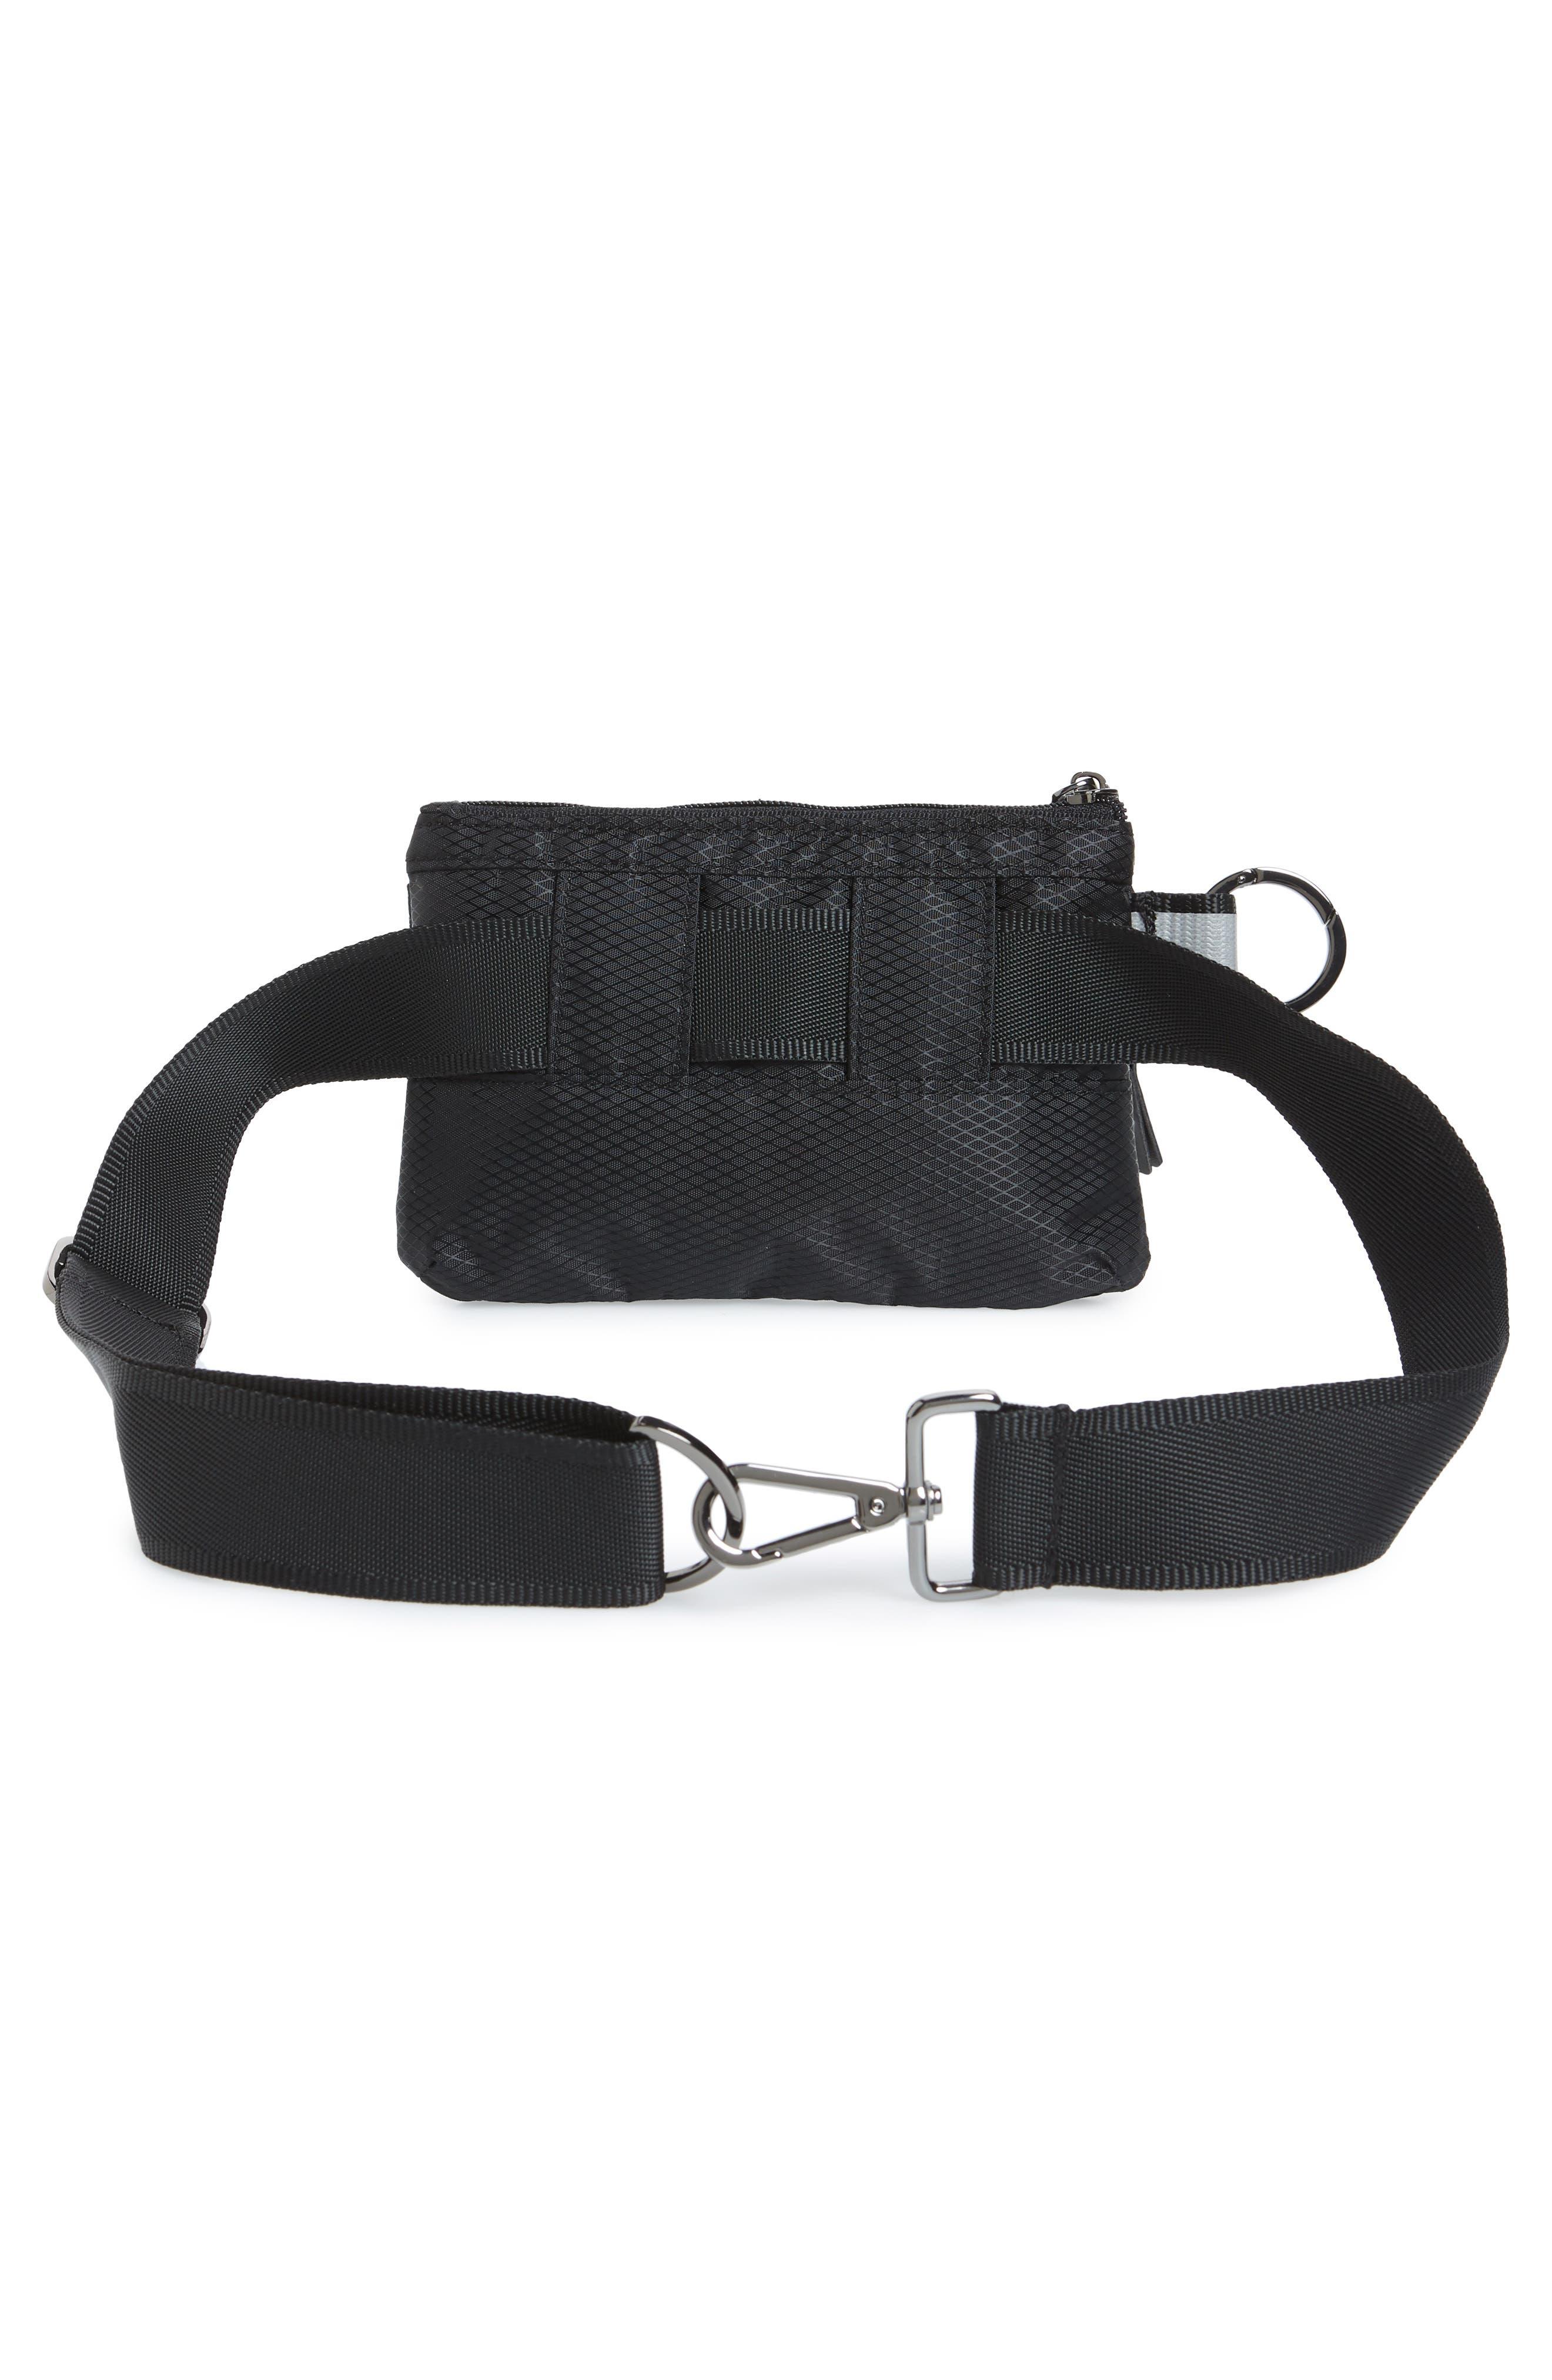 Urban Clutch Convertible Belt Bag,                             Alternate thumbnail 5, color,                             BLACK/ REFLECTIVE STRIPE